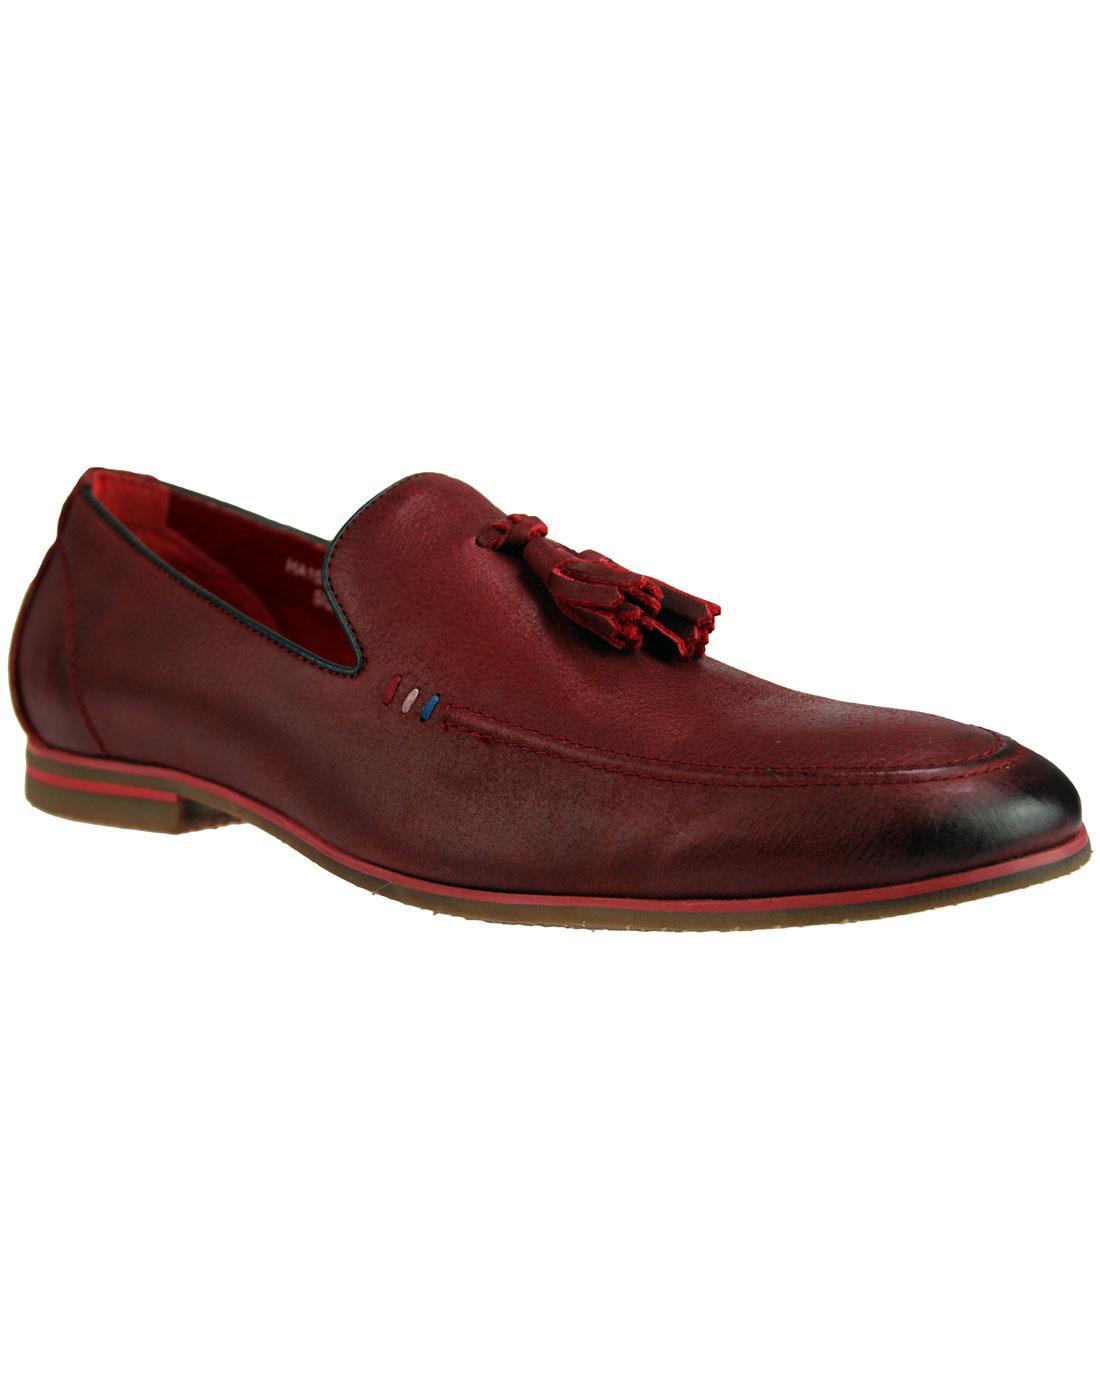 Rene SERGIO DULETTI Leather Tassel loafers WINE